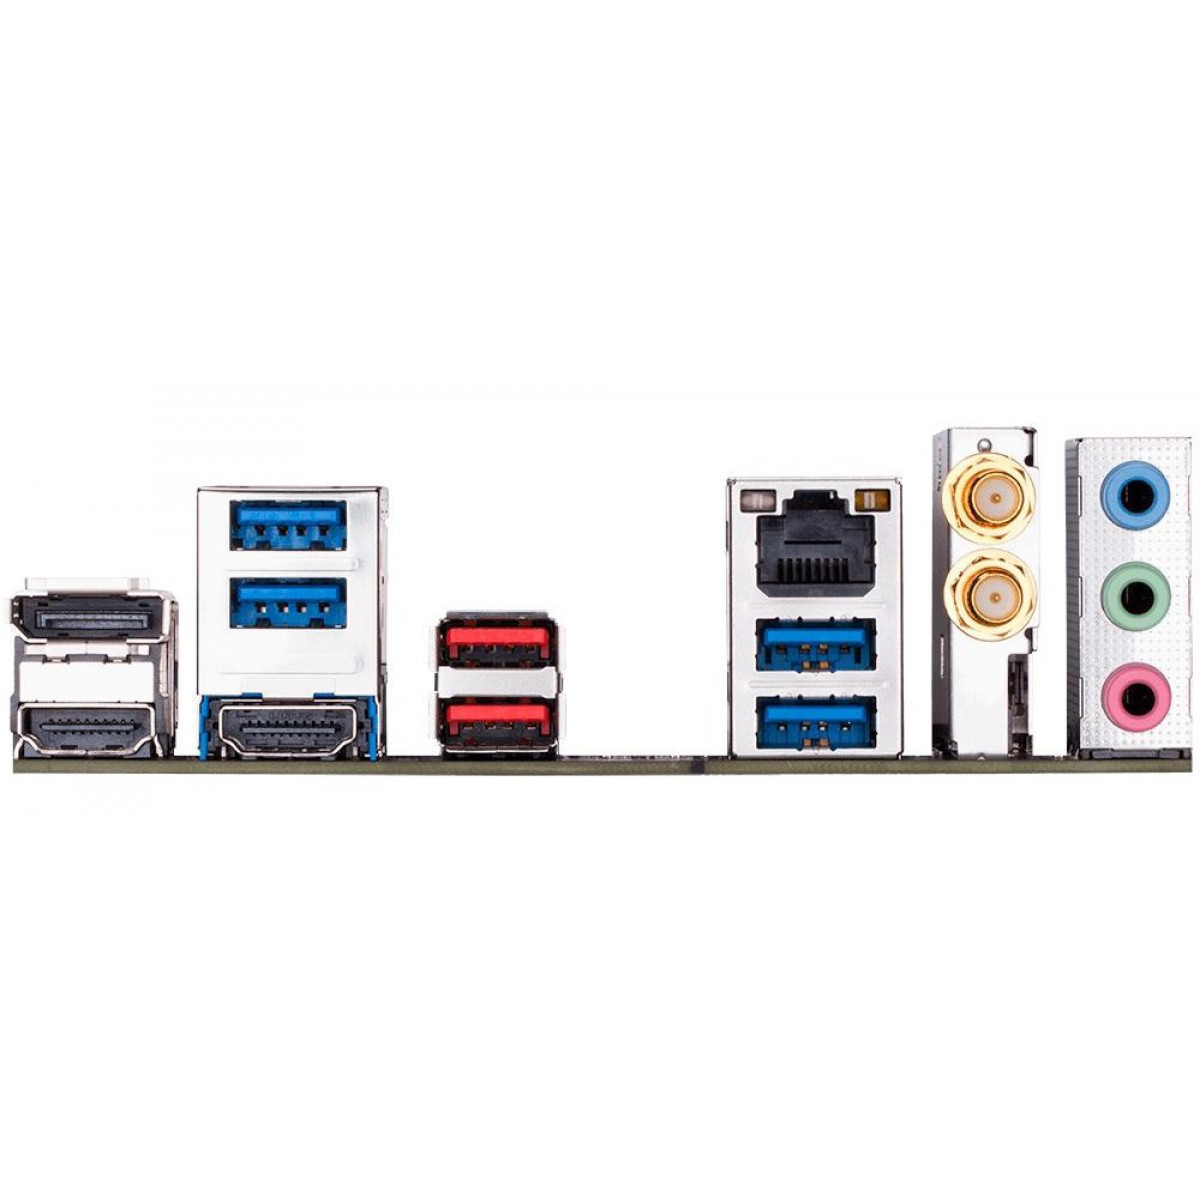 Placa Mãe Gigabyte B450 I Aorus Pro Wifi, Chipset B450, AMD AM4, Mini-ATX, DDR4